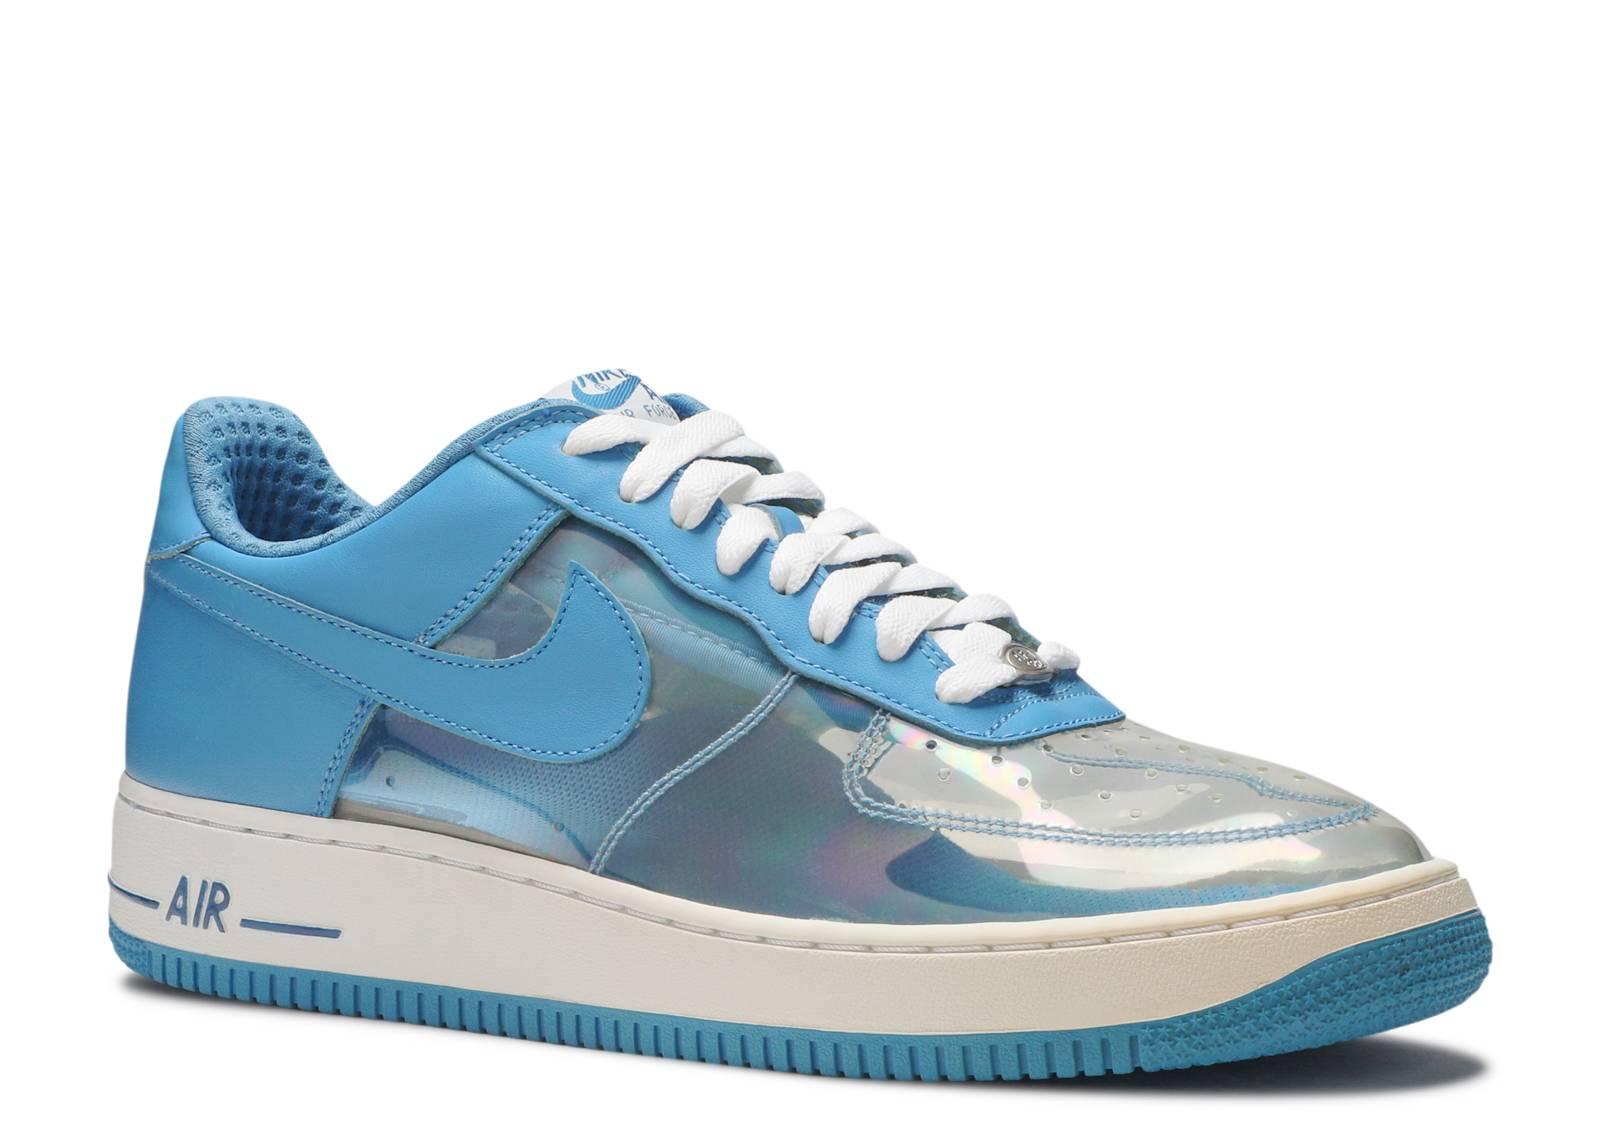 apoyo tema Mostrarte  Air Force 1 Premium 'Fantastic 4 Invisible Woman' - Nike - 313641 941 -  clear/harbor blue-military blue-white | Flight Club